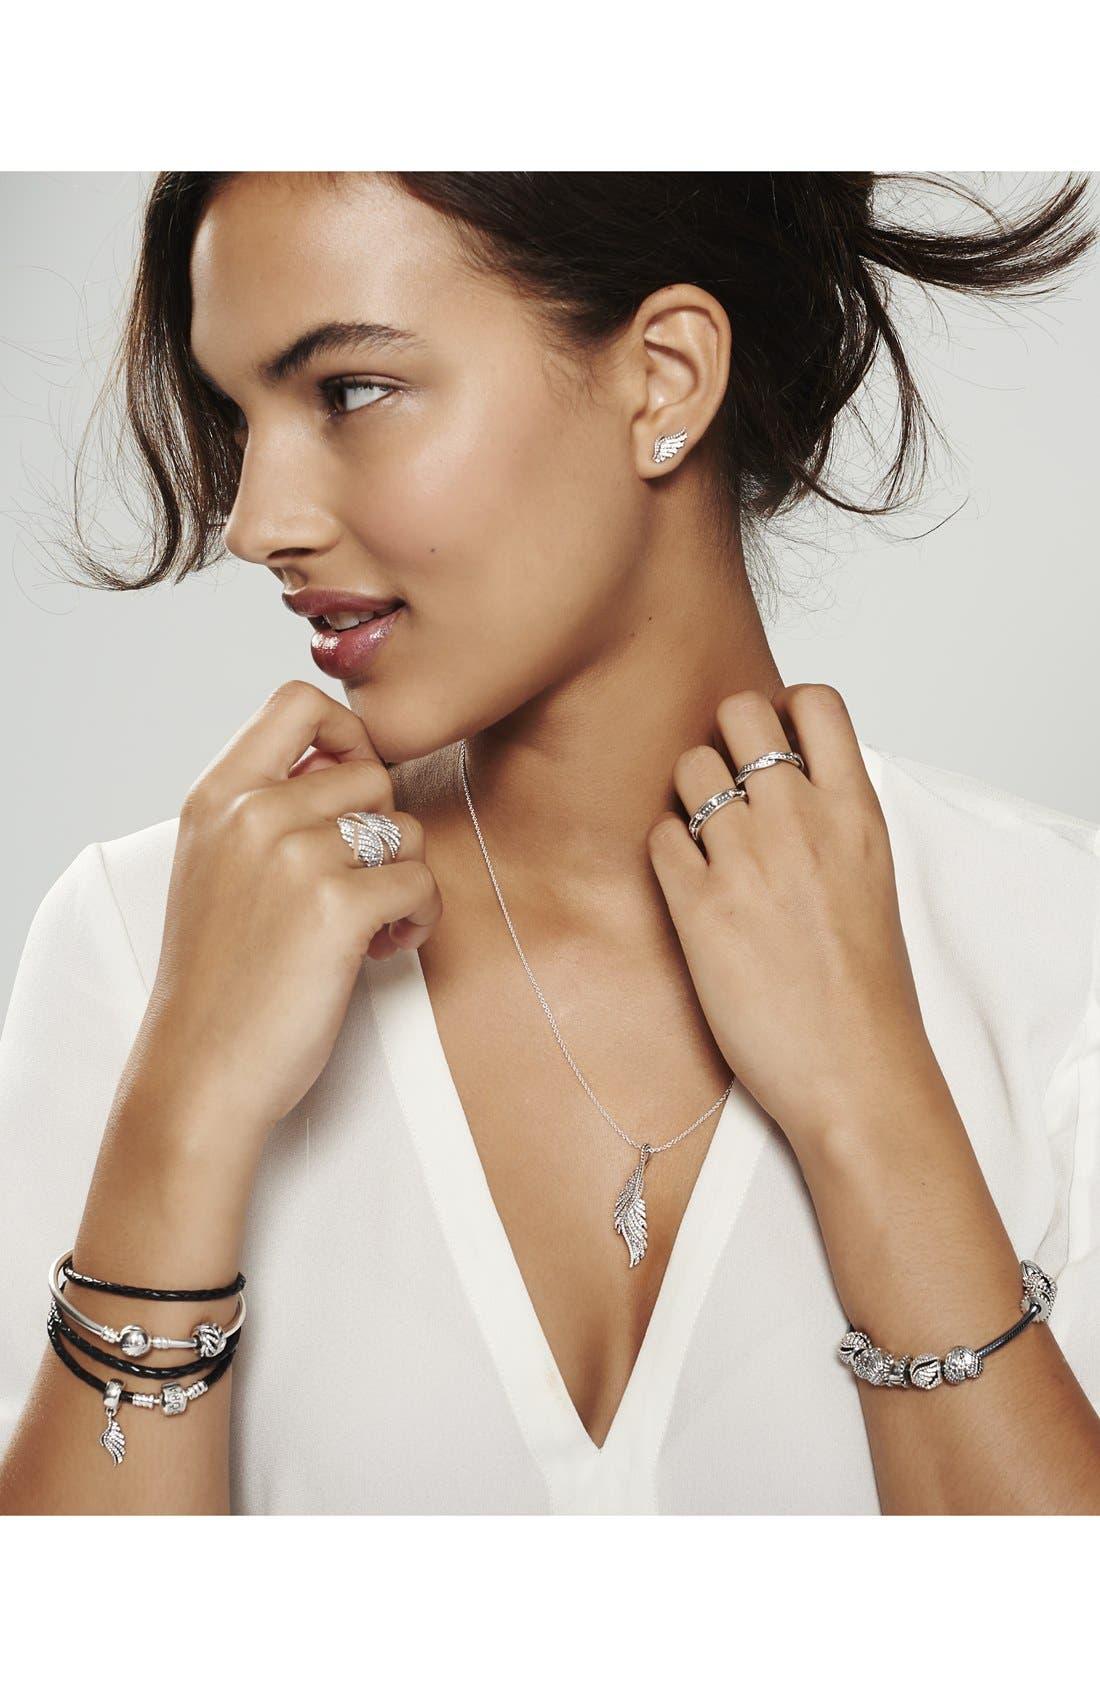 Oxidized Sterling Silver Charm Bracelet,                             Alternate thumbnail 6, color,